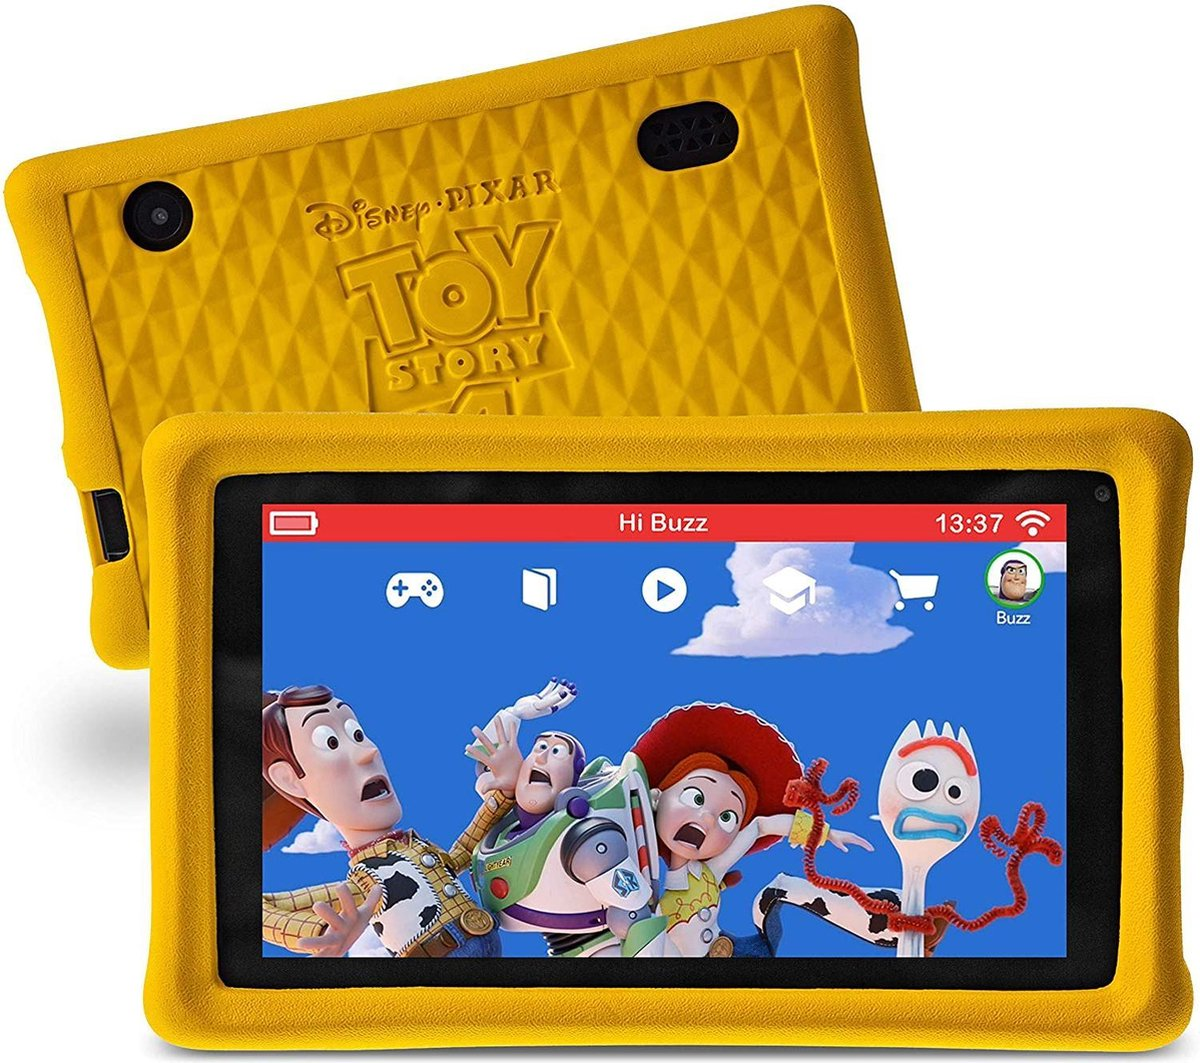 Pebble Gear Kindertablet Disney Toy Story Set Etui- 7 inch – 1GB – Android 8.1- 500 spelletjes – Ouderlijk toezicht